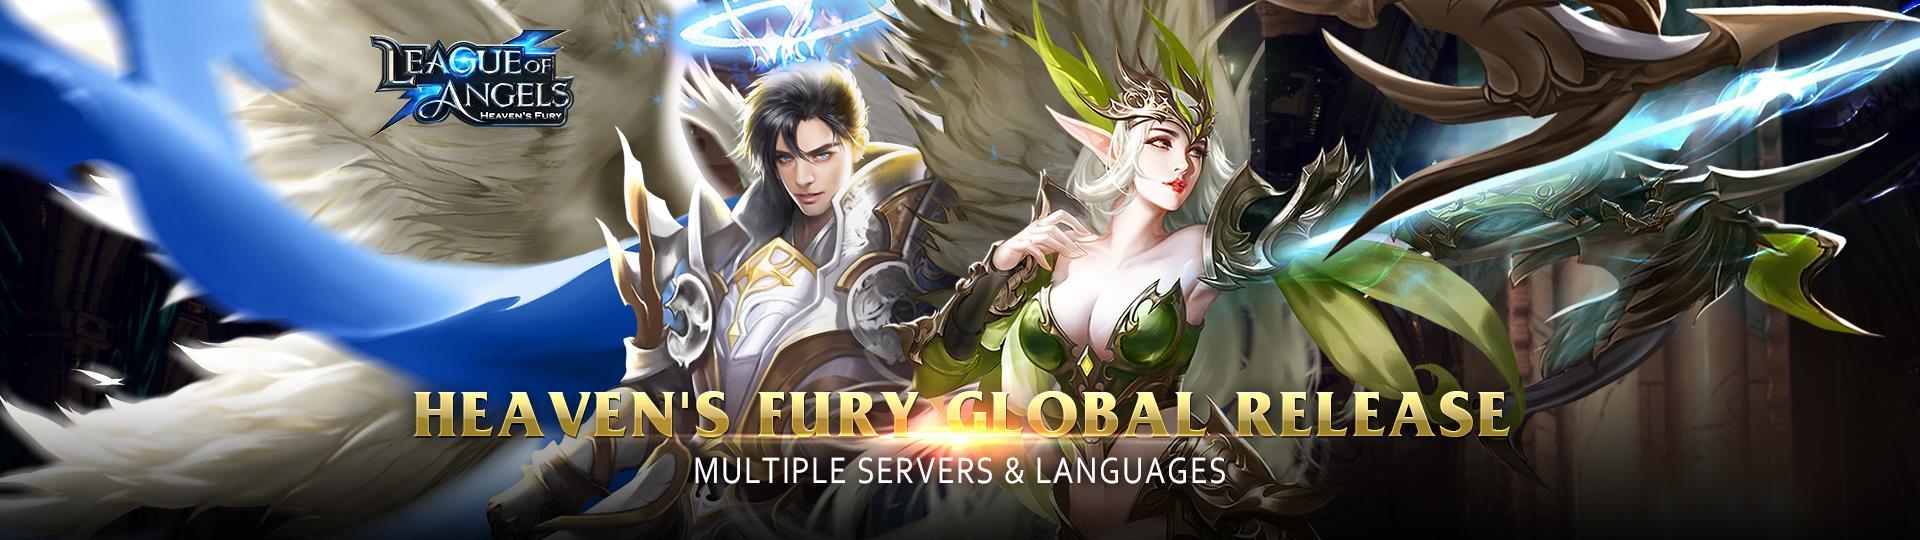 League of Angels Heaven Fury global release